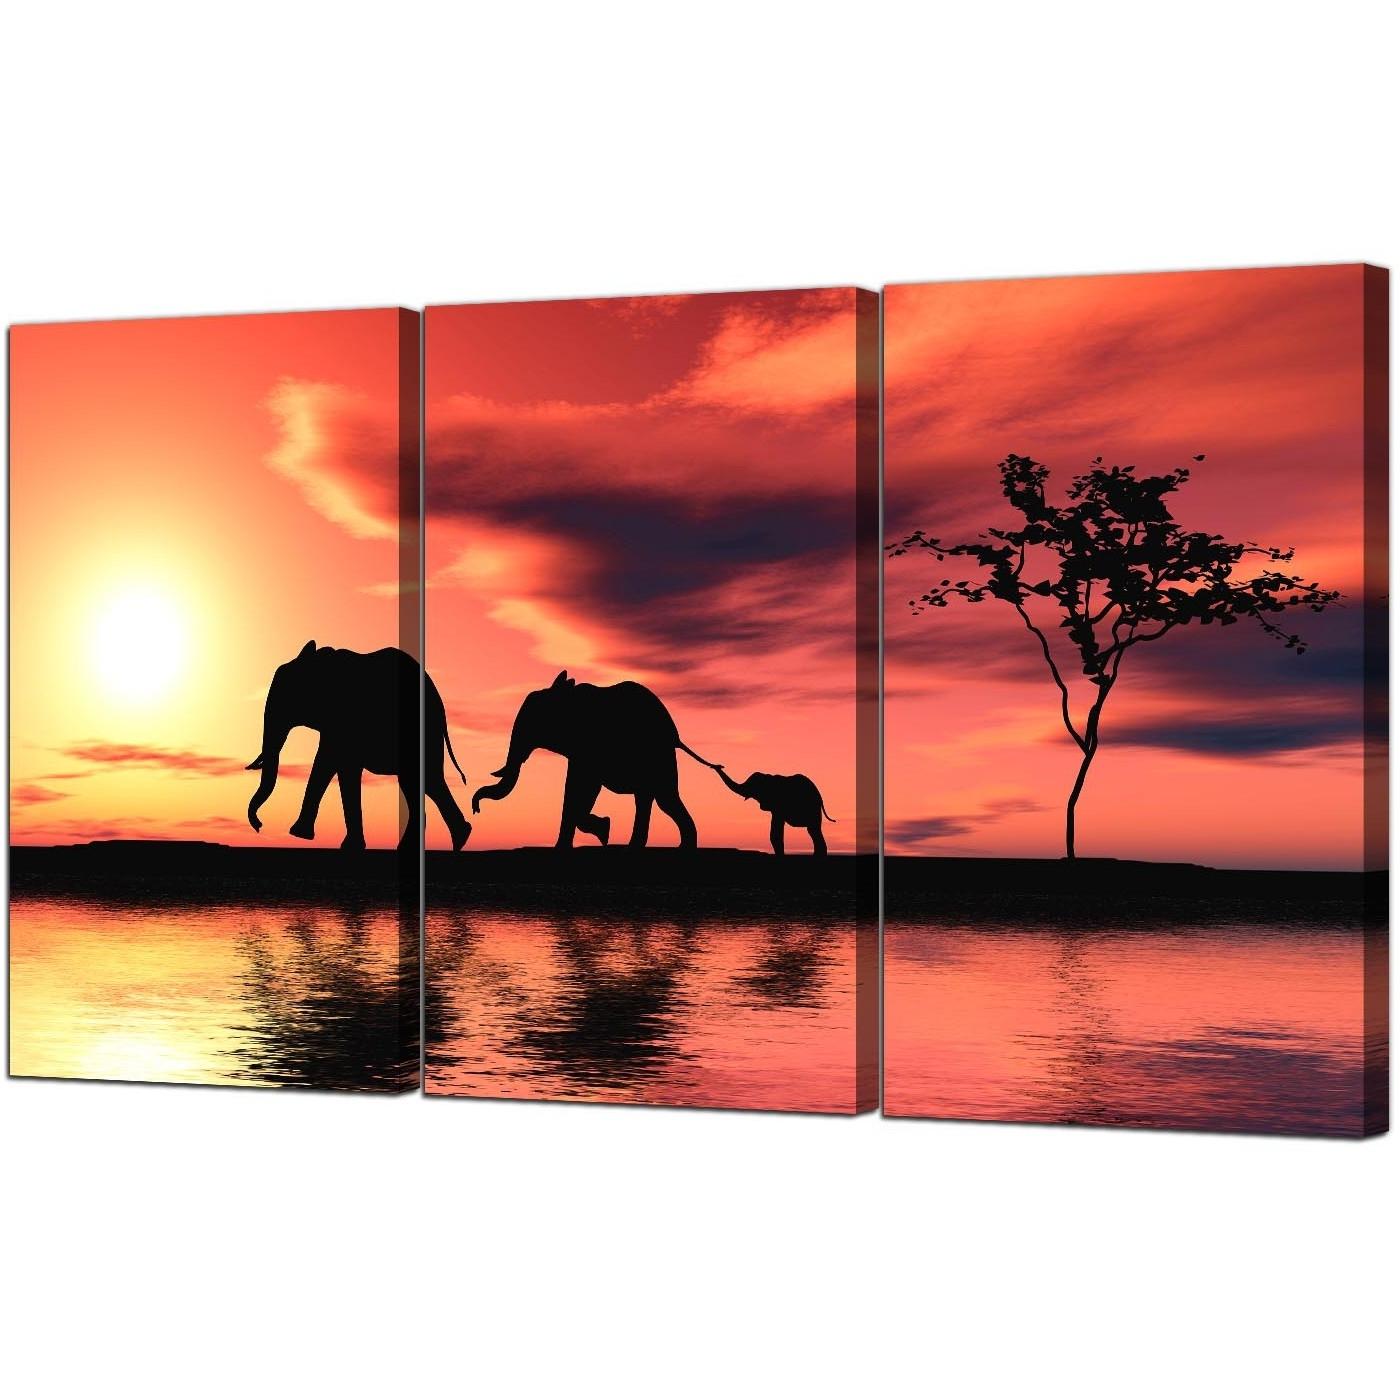 Elephant Canvas Wall Art regarding Popular Elephants Canvas Prints Set Of 3 For Your Living Room